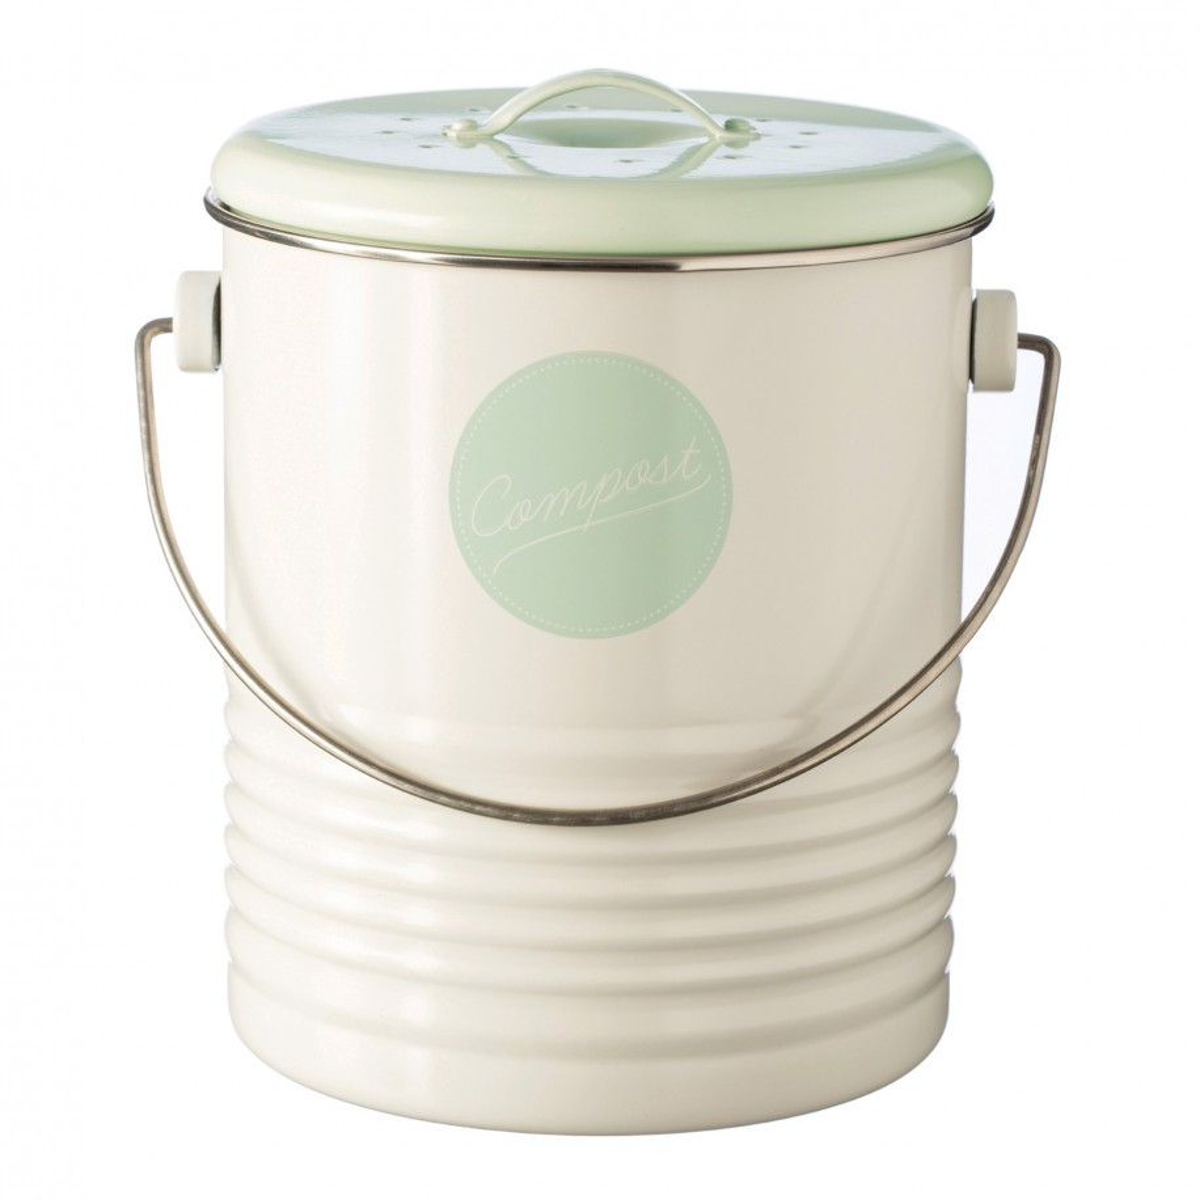 Typhoon kompostspand, 2,5 L - beige/grøn